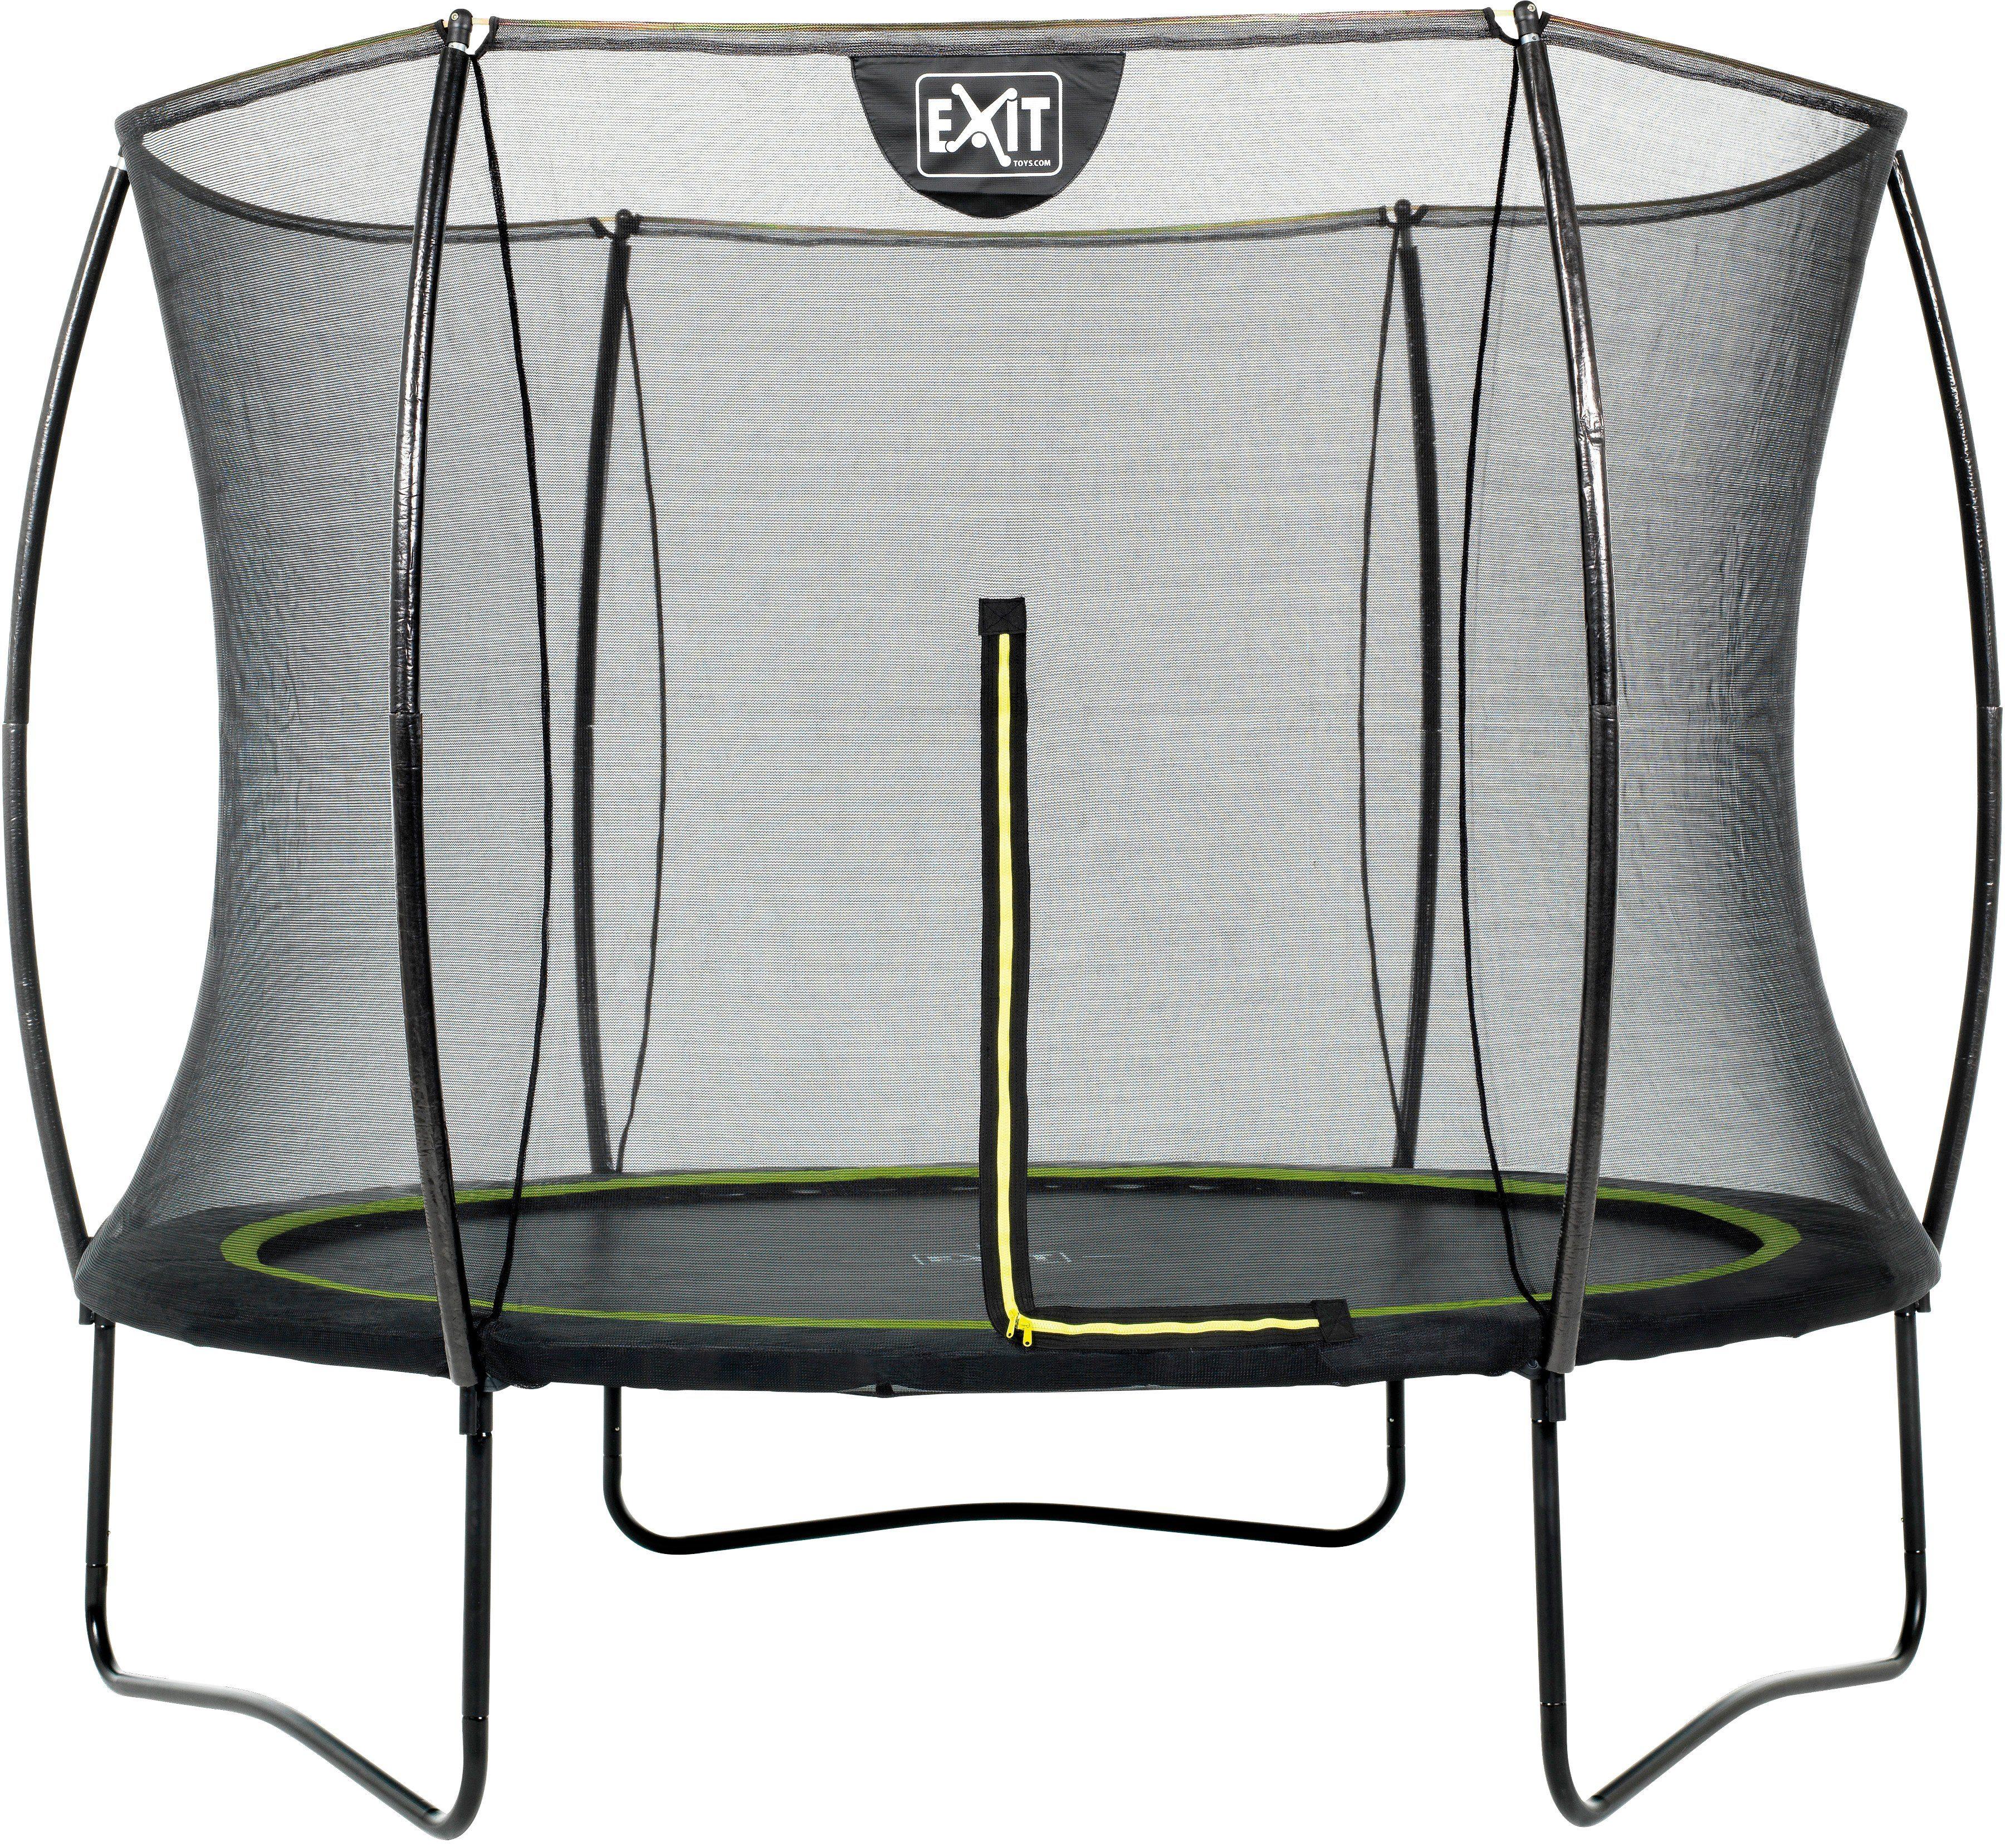 EXIT Trampolin »Silhouette«, Ø: 244 cm